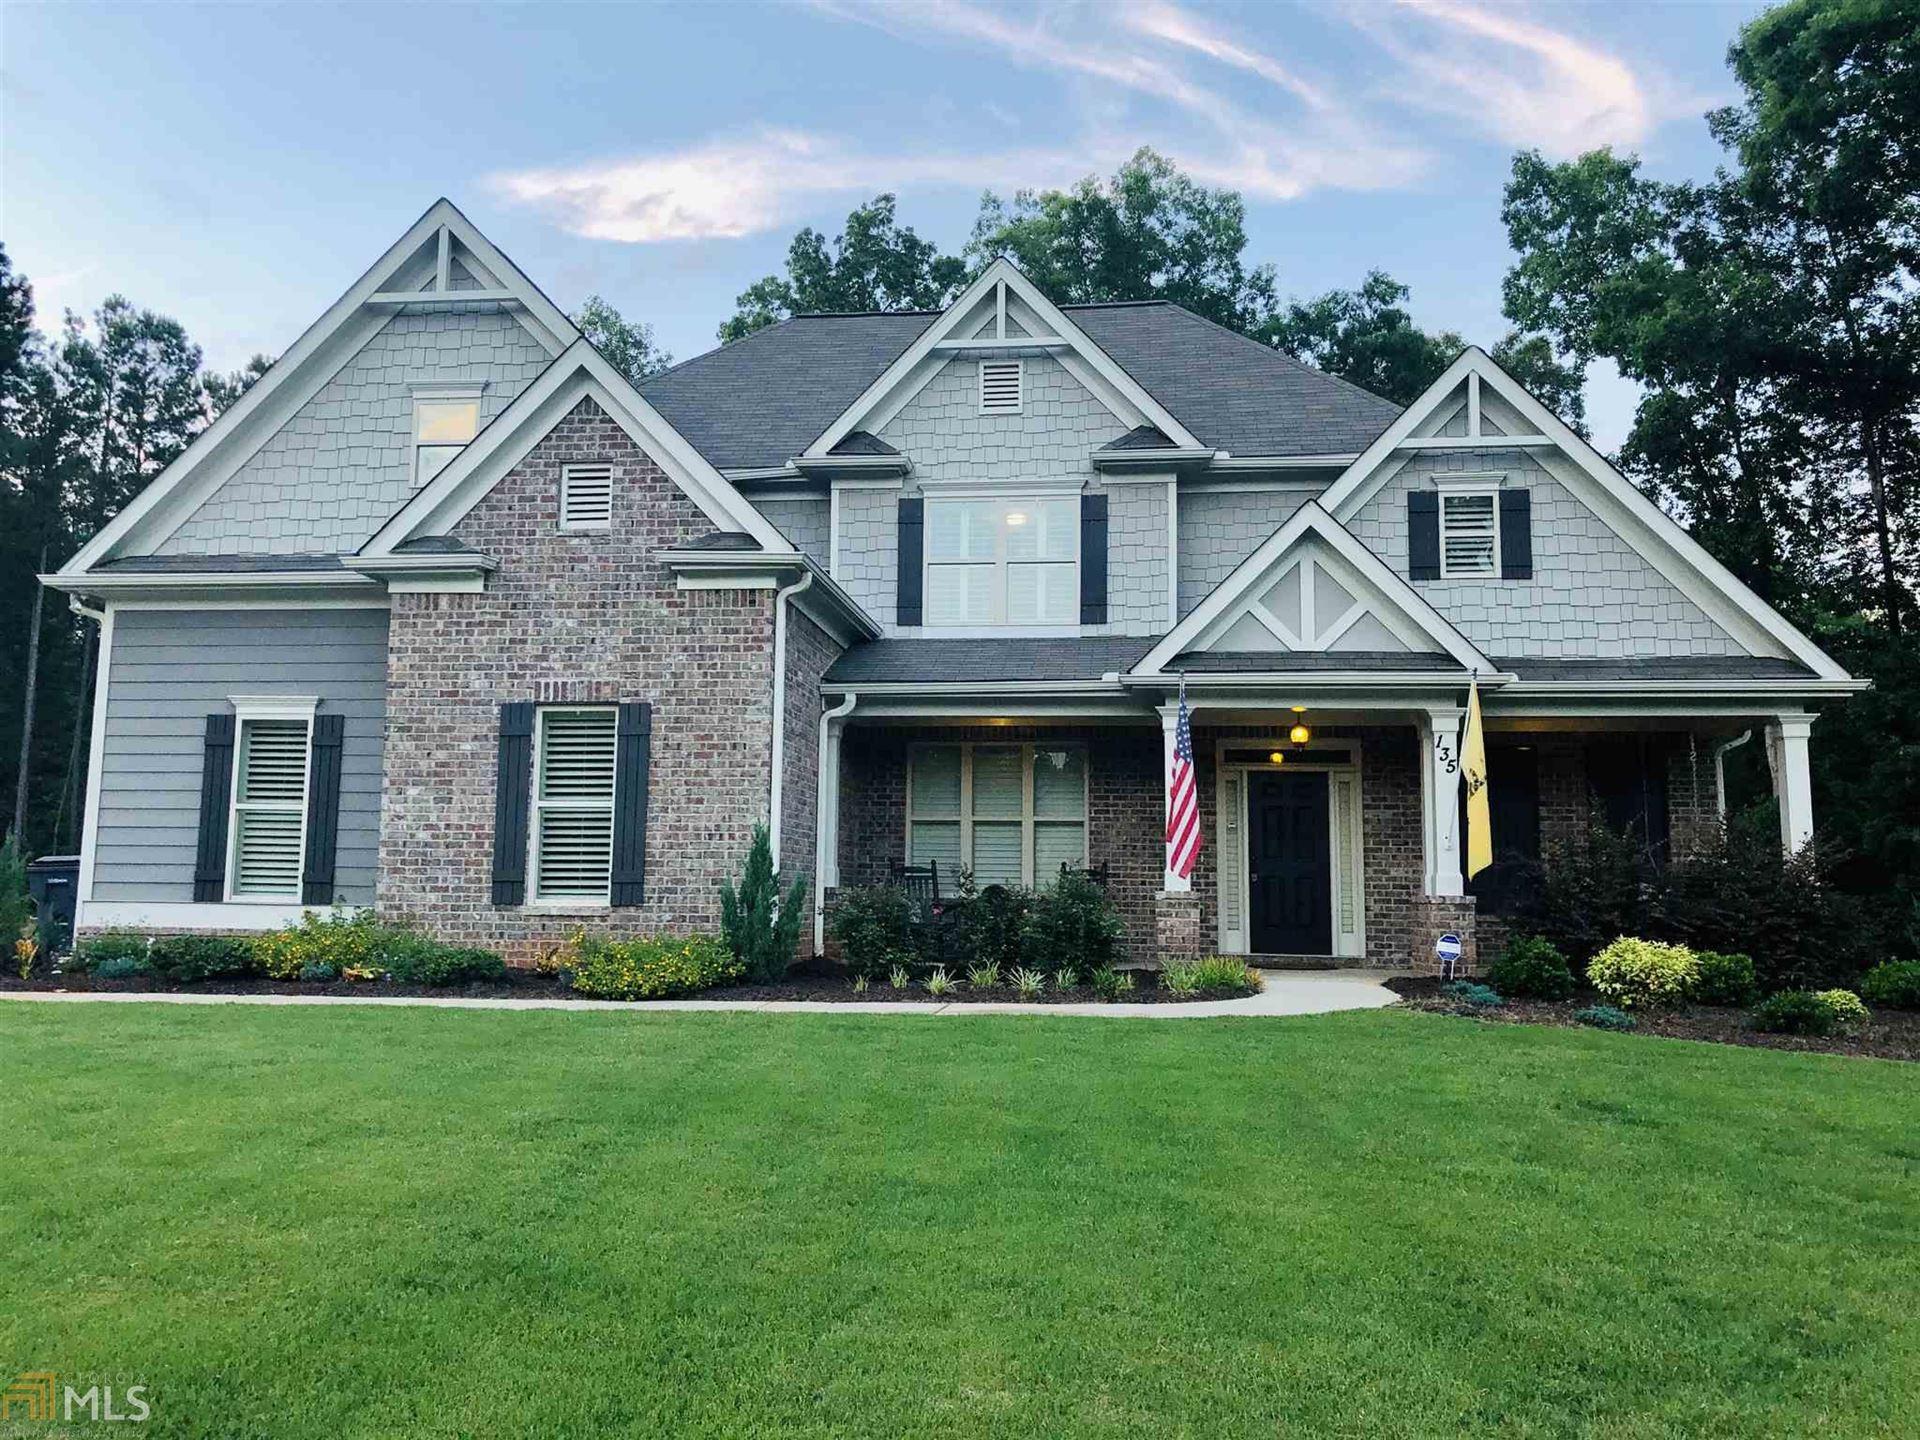 135 Spring Creek Dr, Rutledge, GA 30663 - #: 8872564